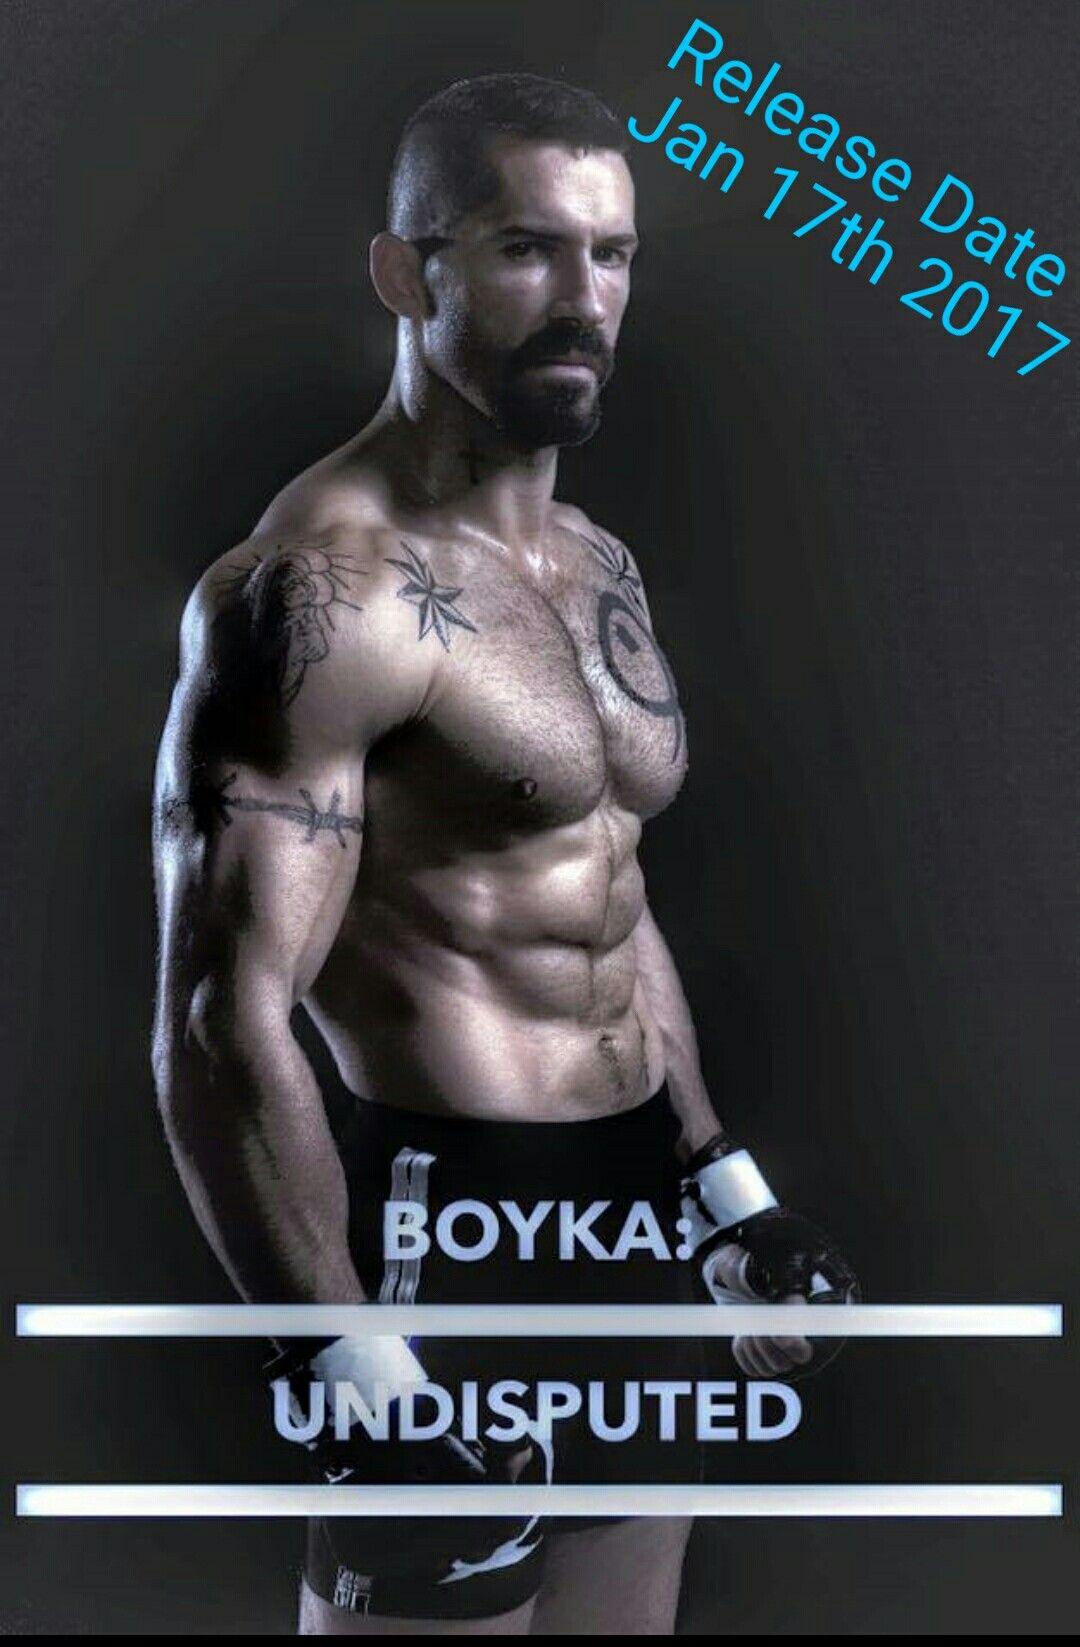 Undisputed 4 January 17th 2017 Scott Adkins Action Movie Stars Martial Arts